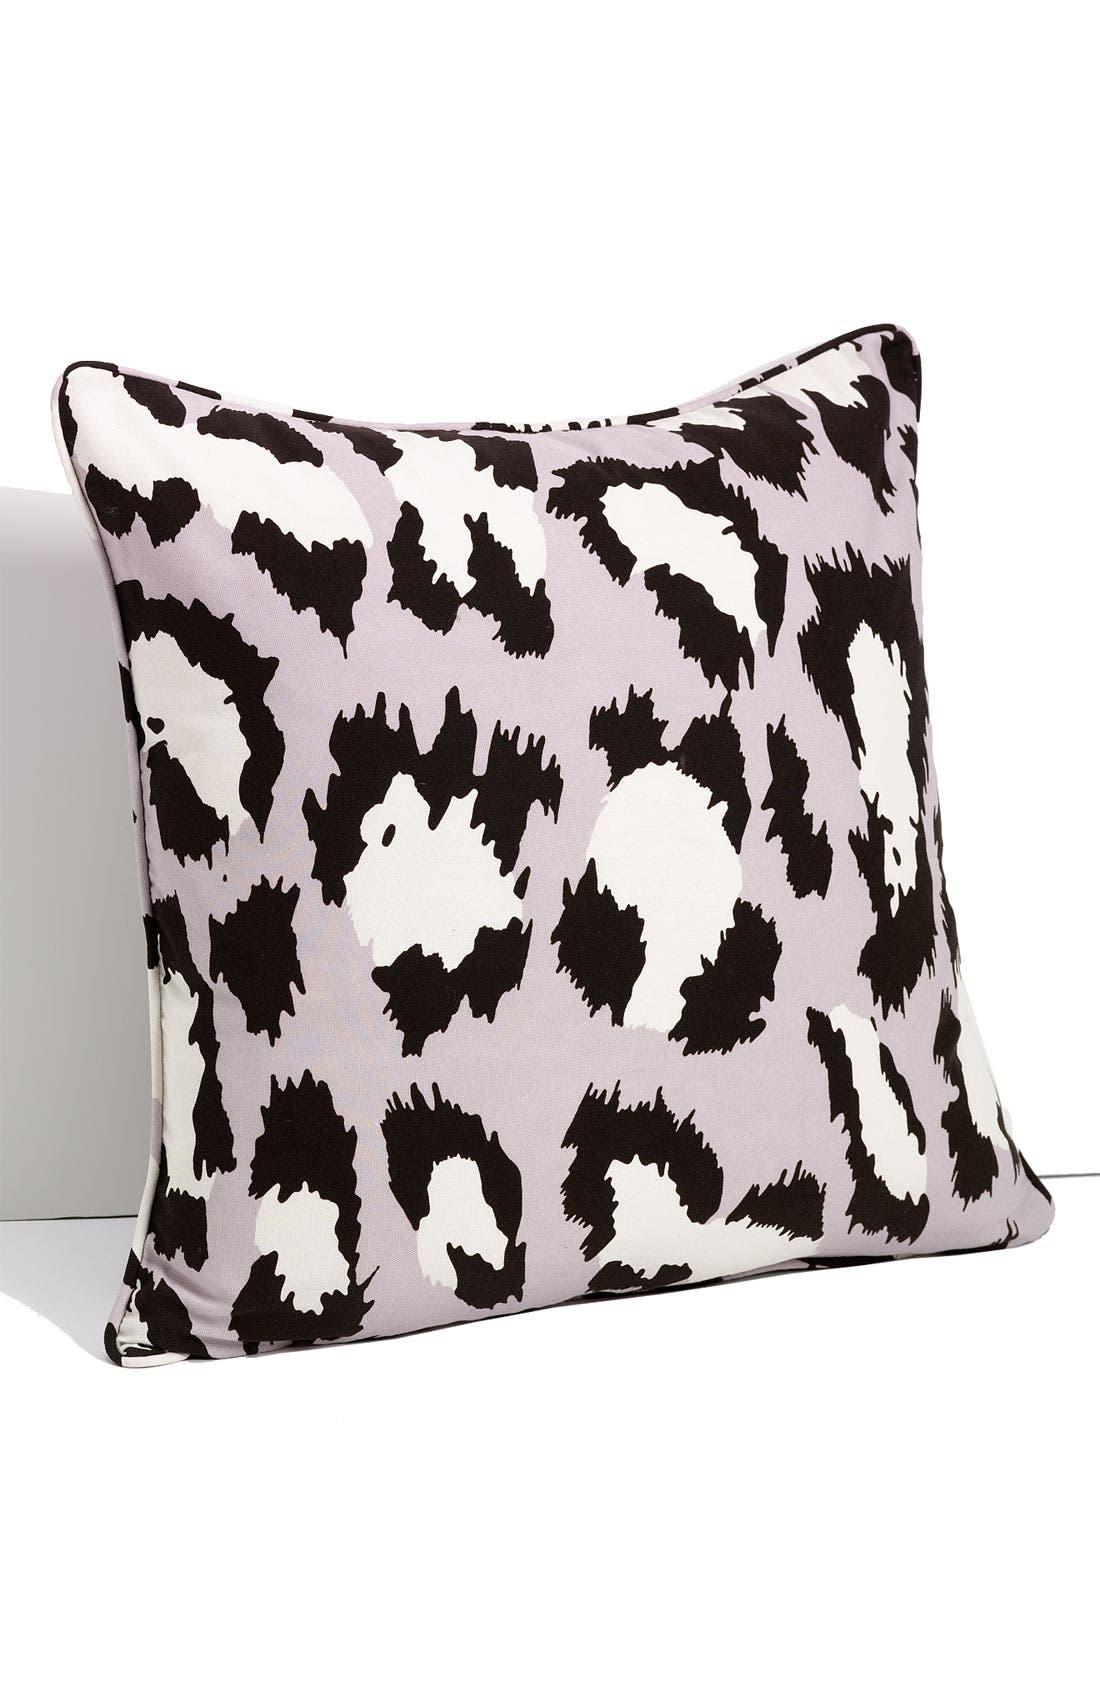 Alternate Image 1 Selected - Diane von Furstenberg 'Spotted Cat' Pillow